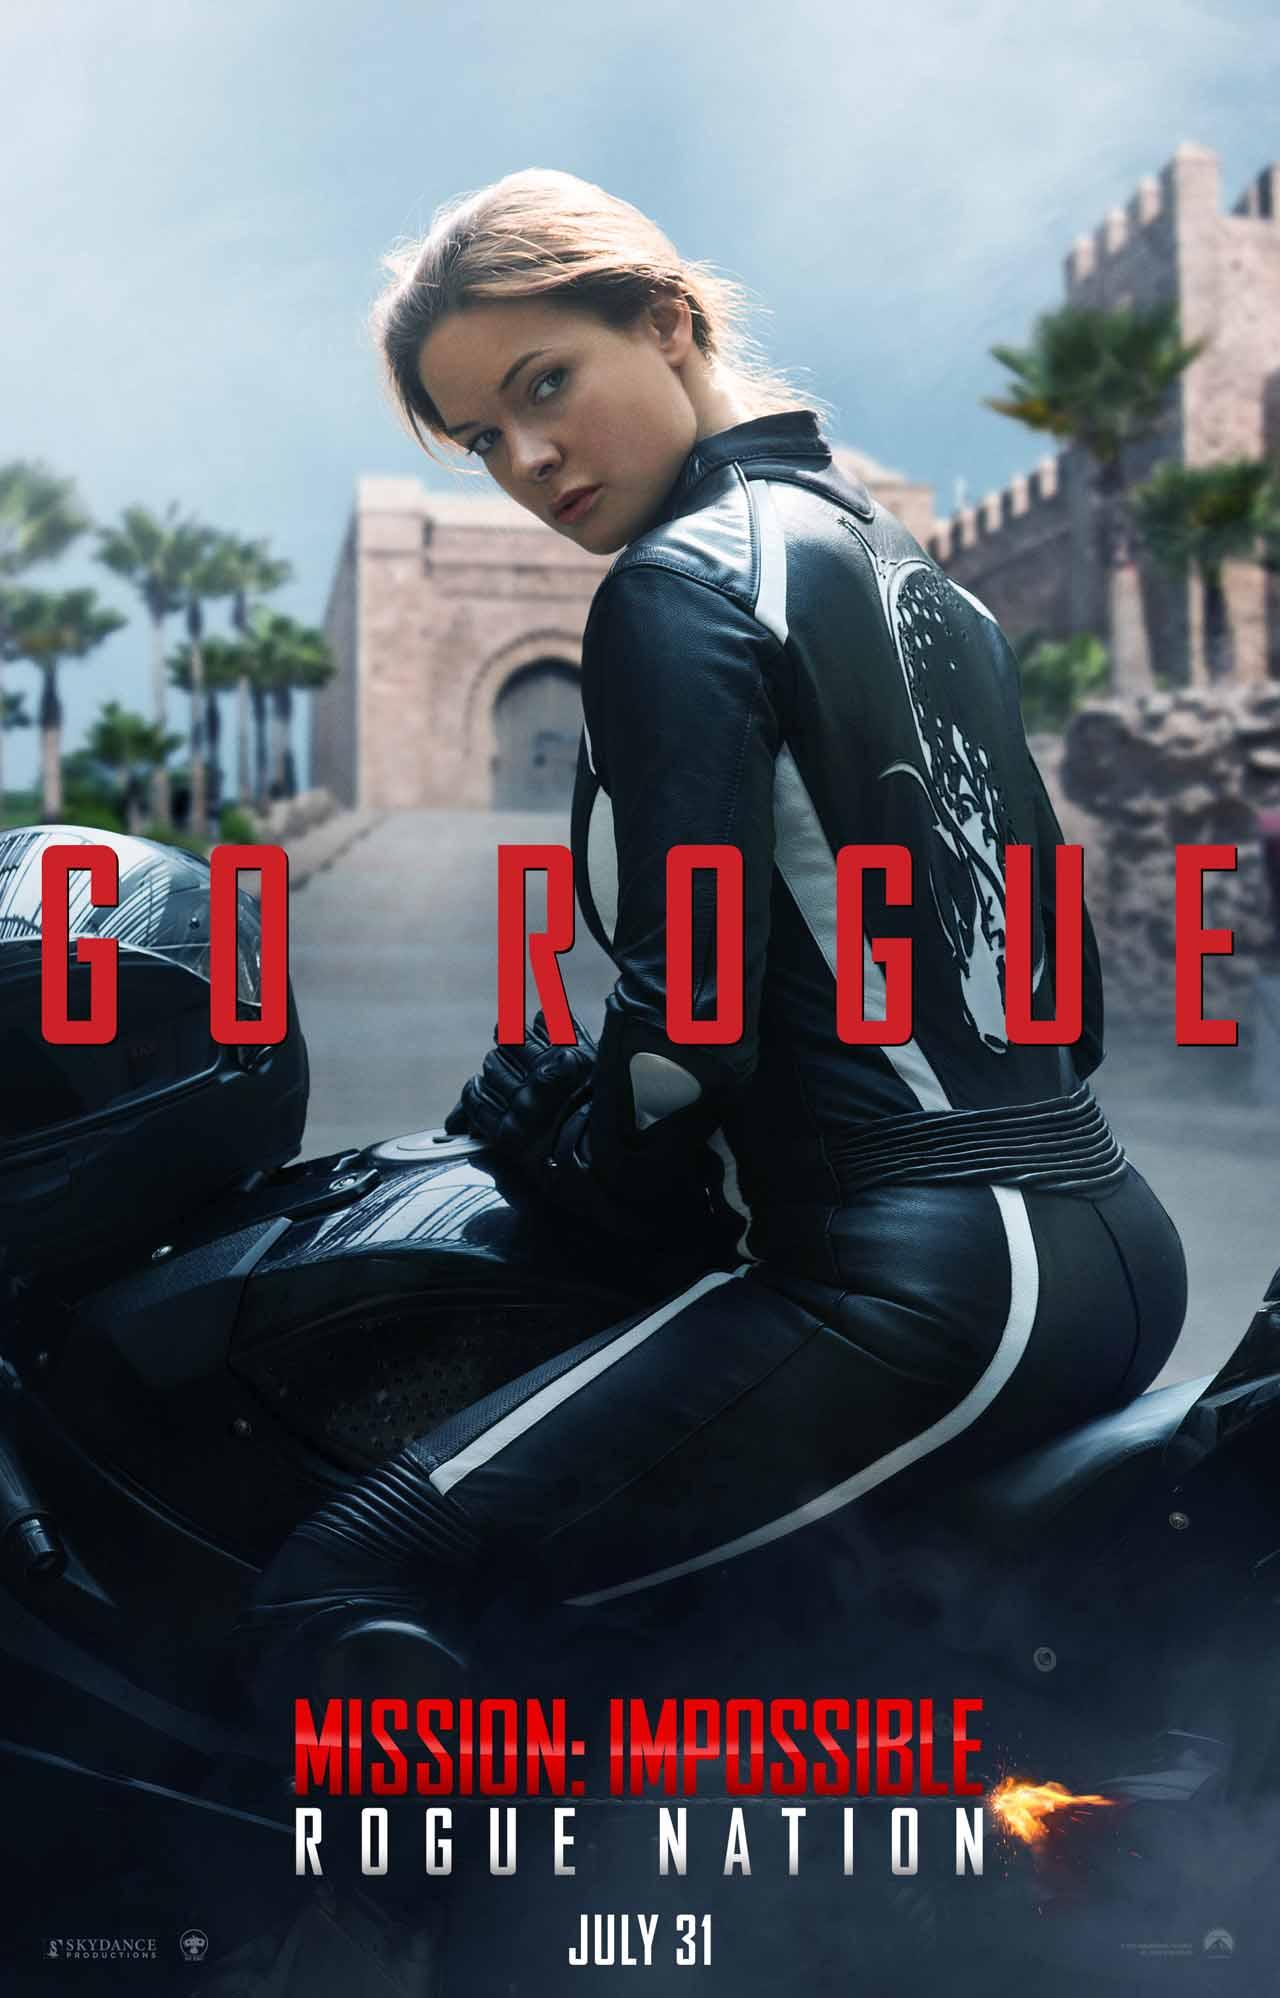 mission impossible 5 rogue nation zweiter trailer mit tom cruise ist da giga. Black Bedroom Furniture Sets. Home Design Ideas